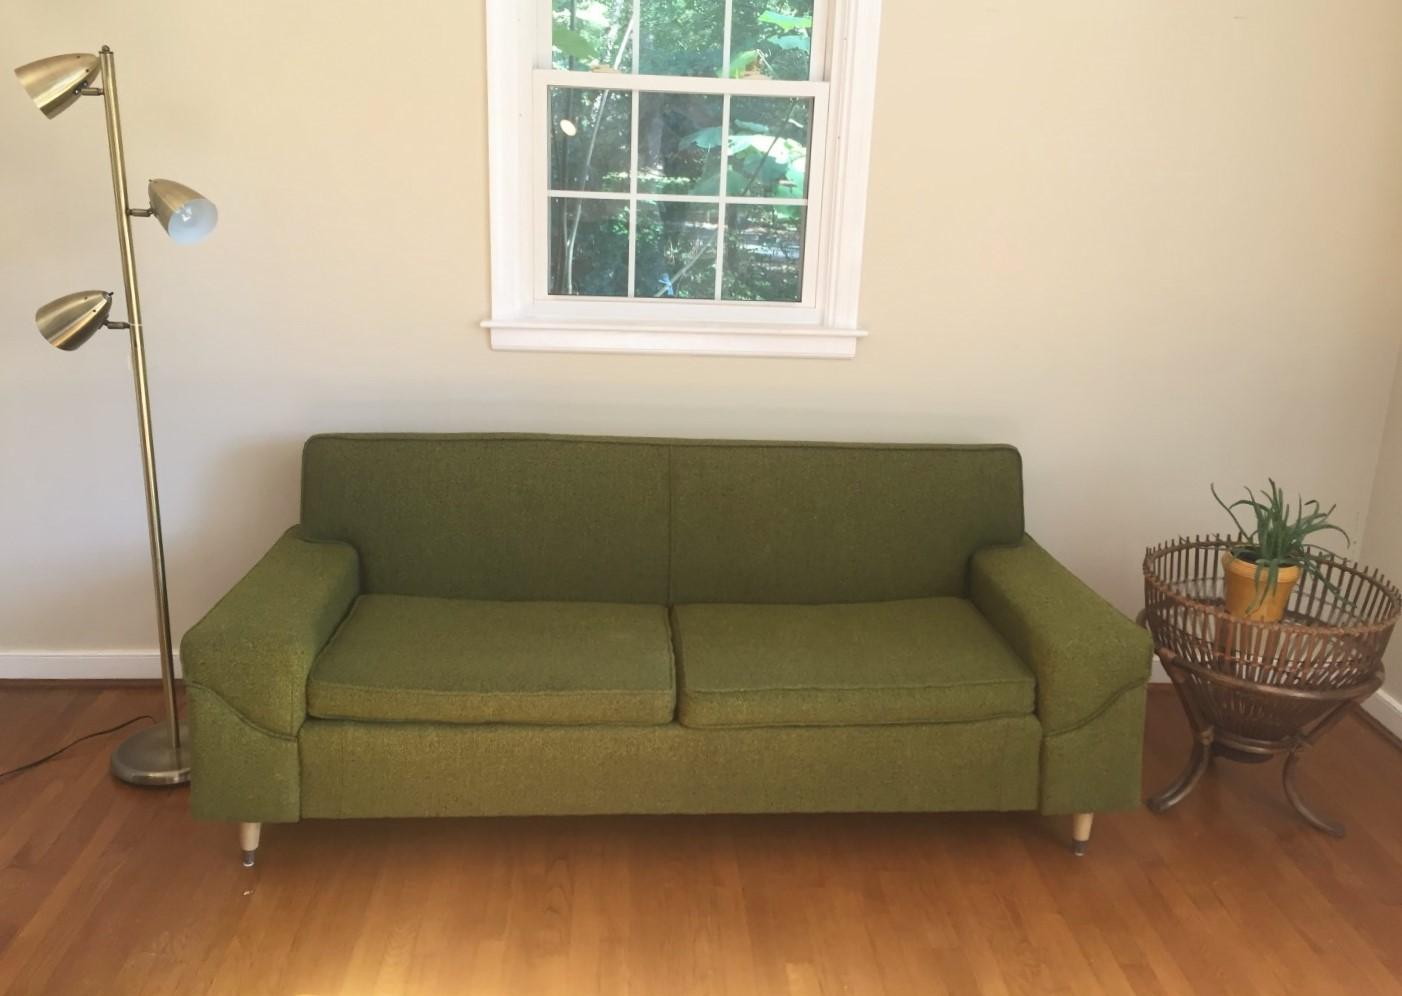 mid century modern vintage sofa by Kroehler